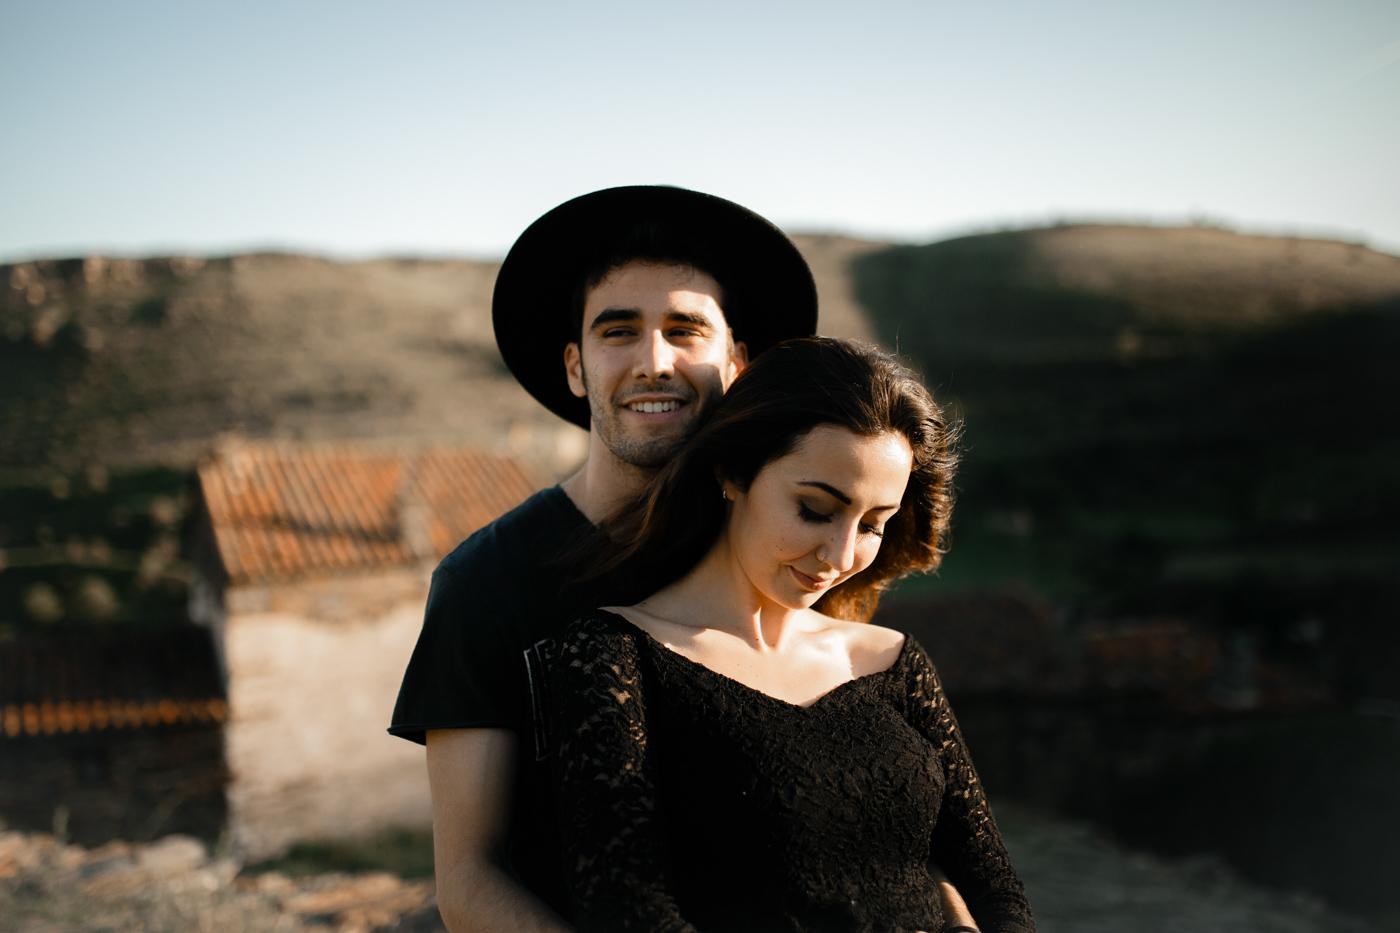 Velvet-Hush-sesion-pareja-patones-berrueco-028